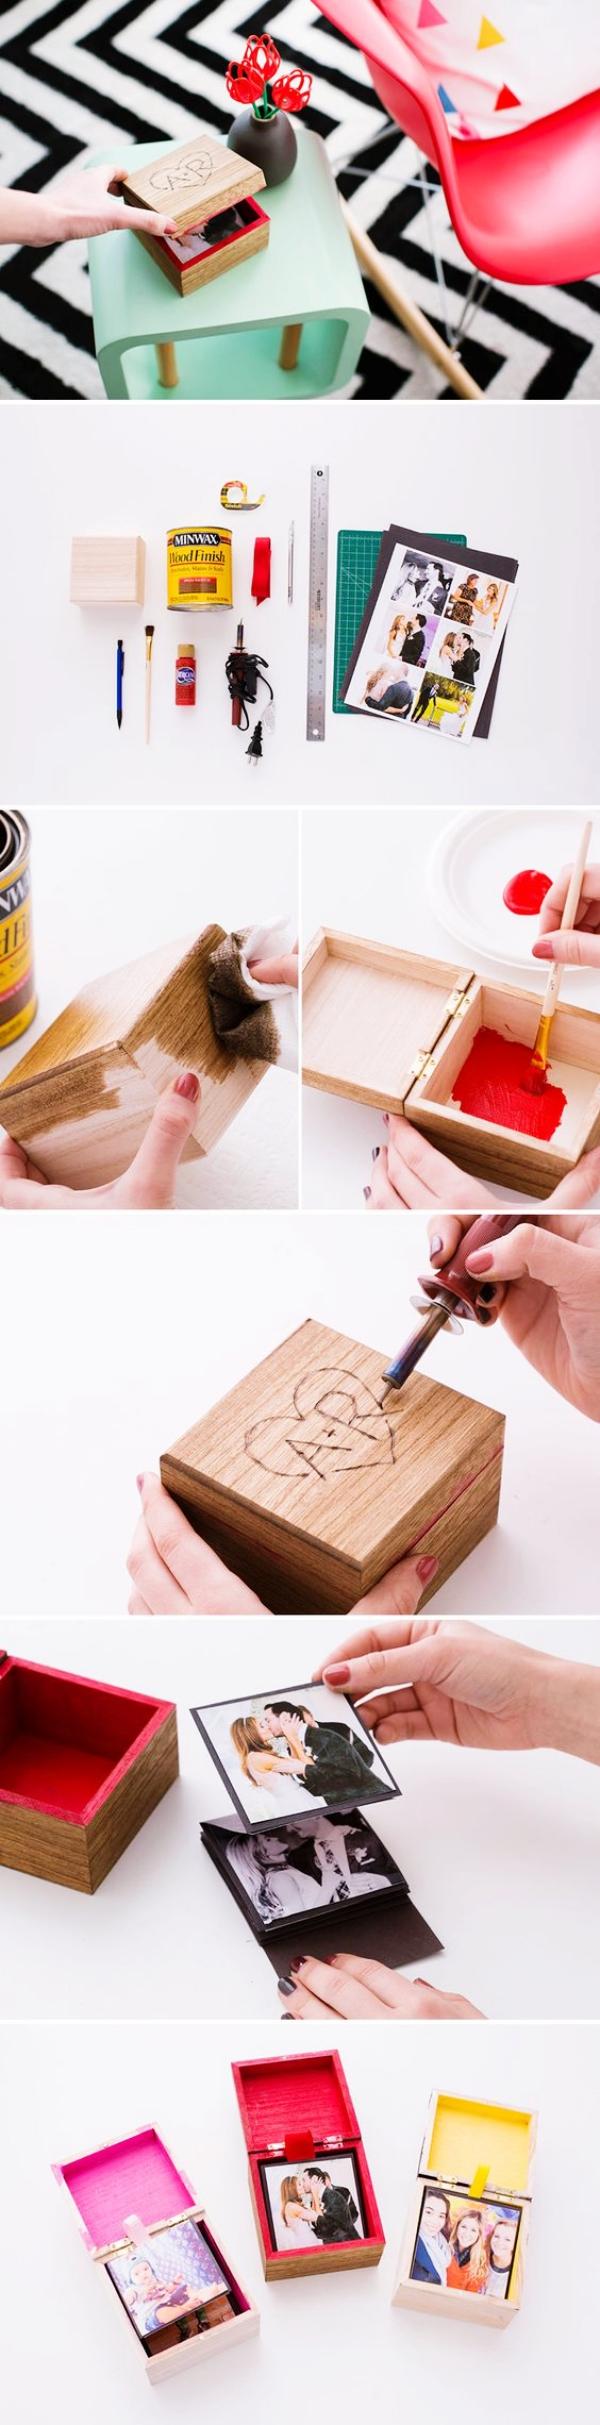 Easy-Peasy-DIY-Christmas-Gift-Ideas-for-Him